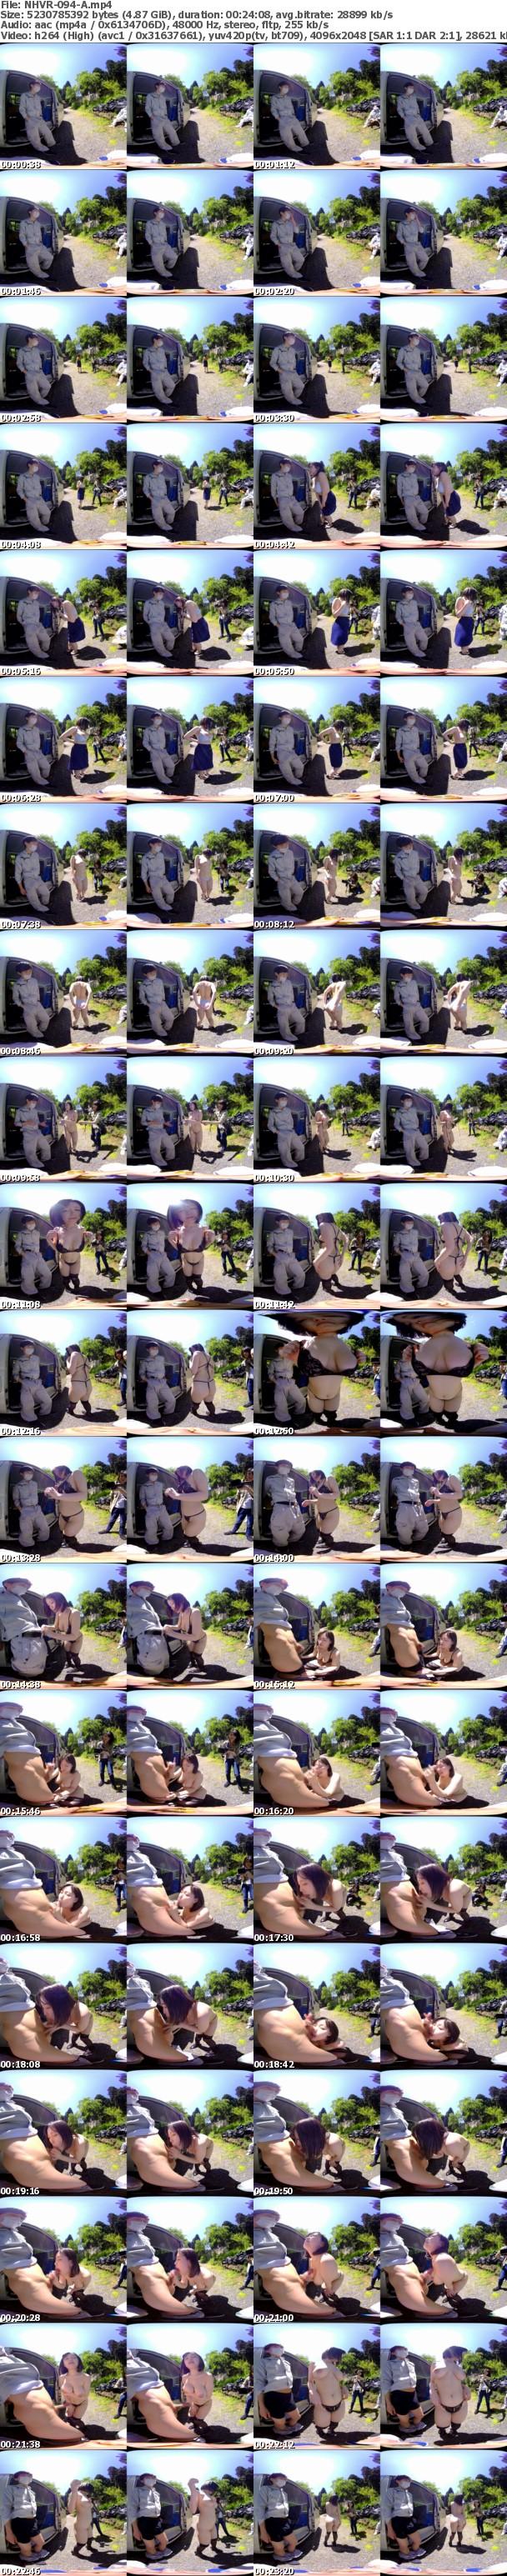 (VR) NHVR-094 露出AVの撮影隊と遭遇 VR 昼休み中の公園で女監督さんに誘われて…その場でAV出演!いやらしい田中ねねちゃんに圧倒されて青姦してしまった僕